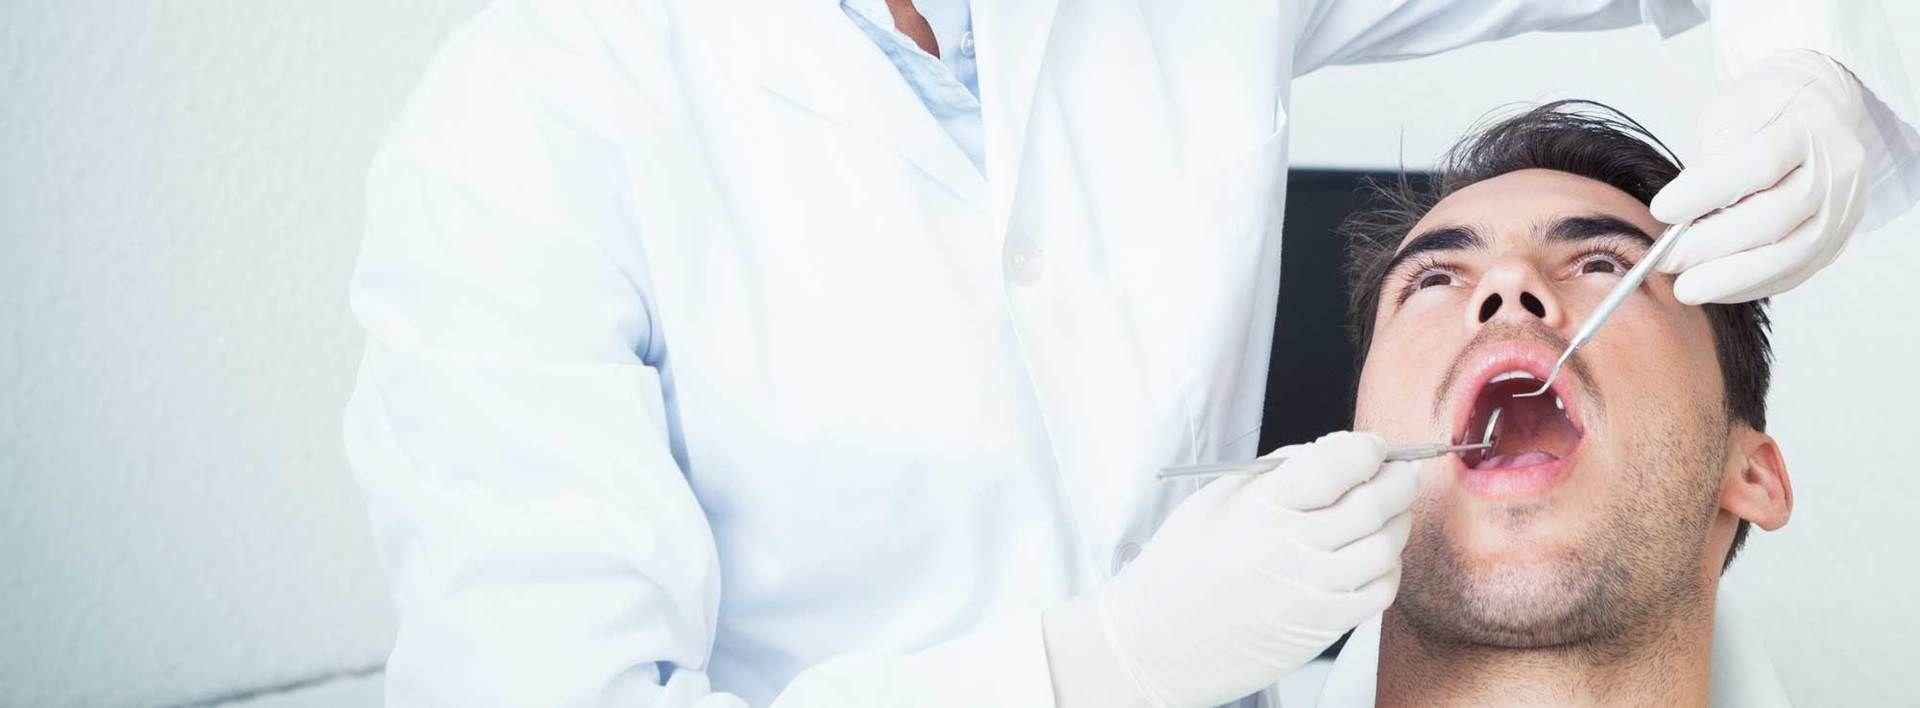 Dr marichia attalla nassau county periodontist https